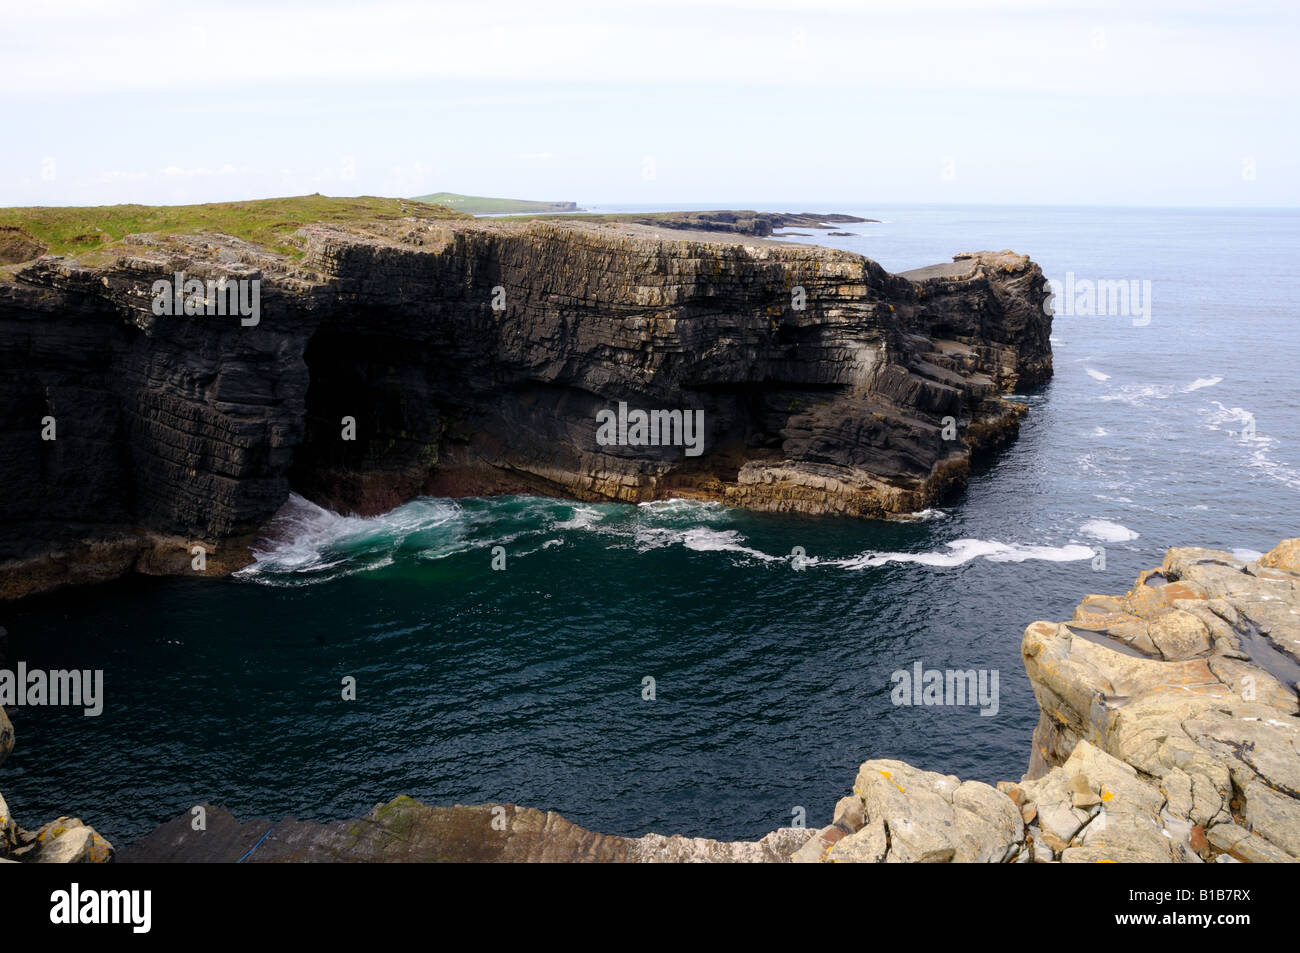 Rocky cliff at the Atlantic coast of western Ireland. - Stock Image